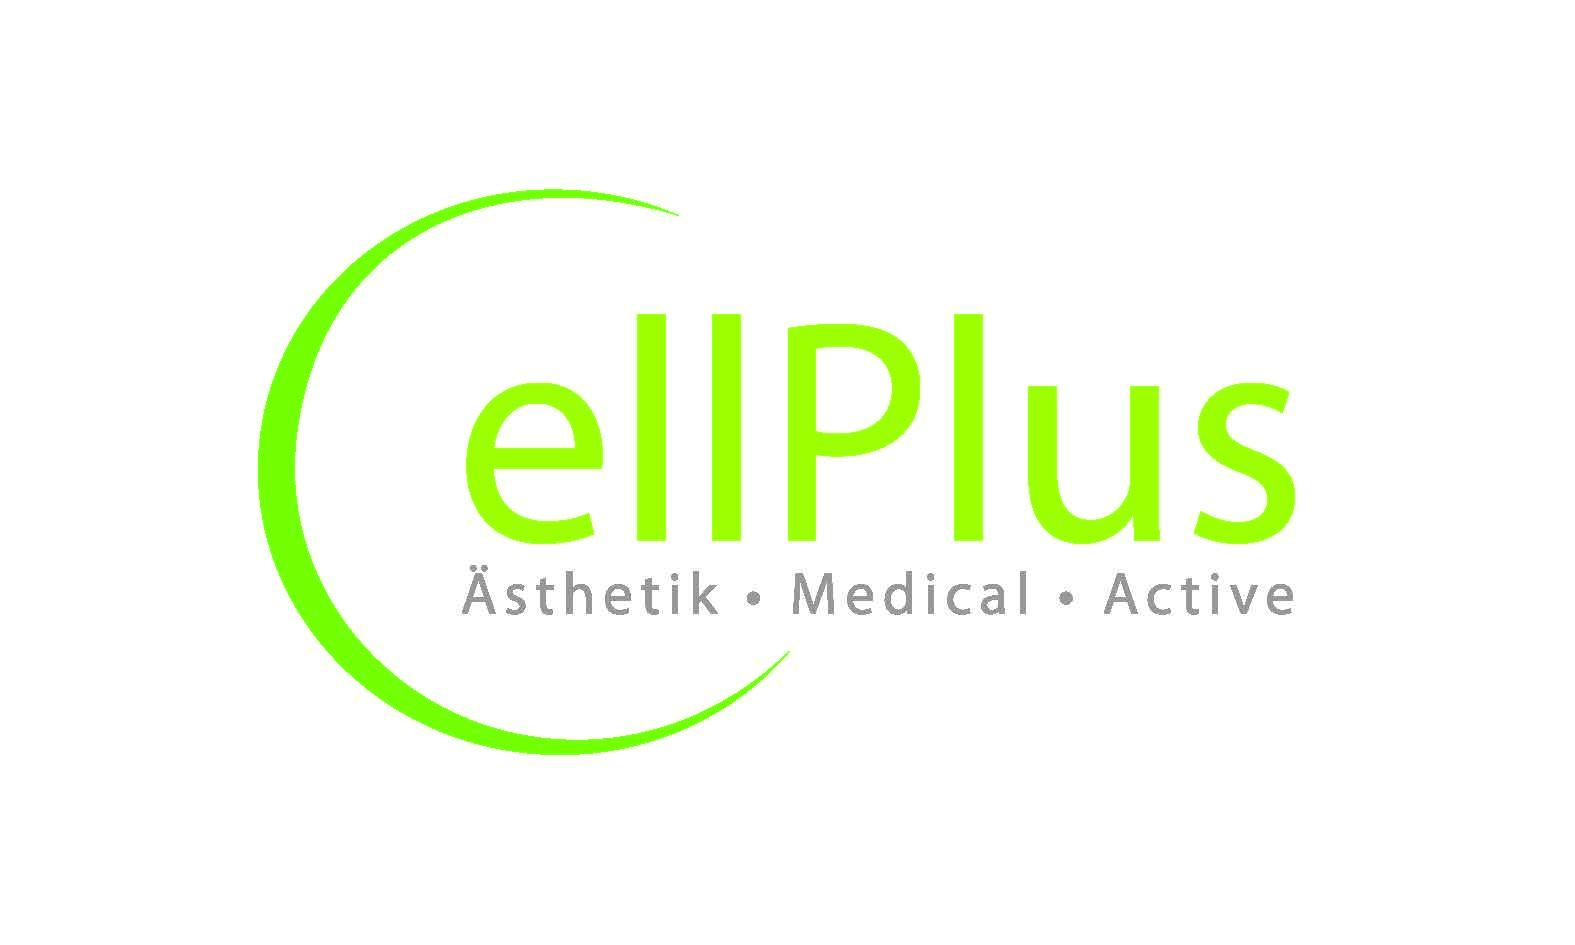 Logo CellPlus__Rahmen.jpg